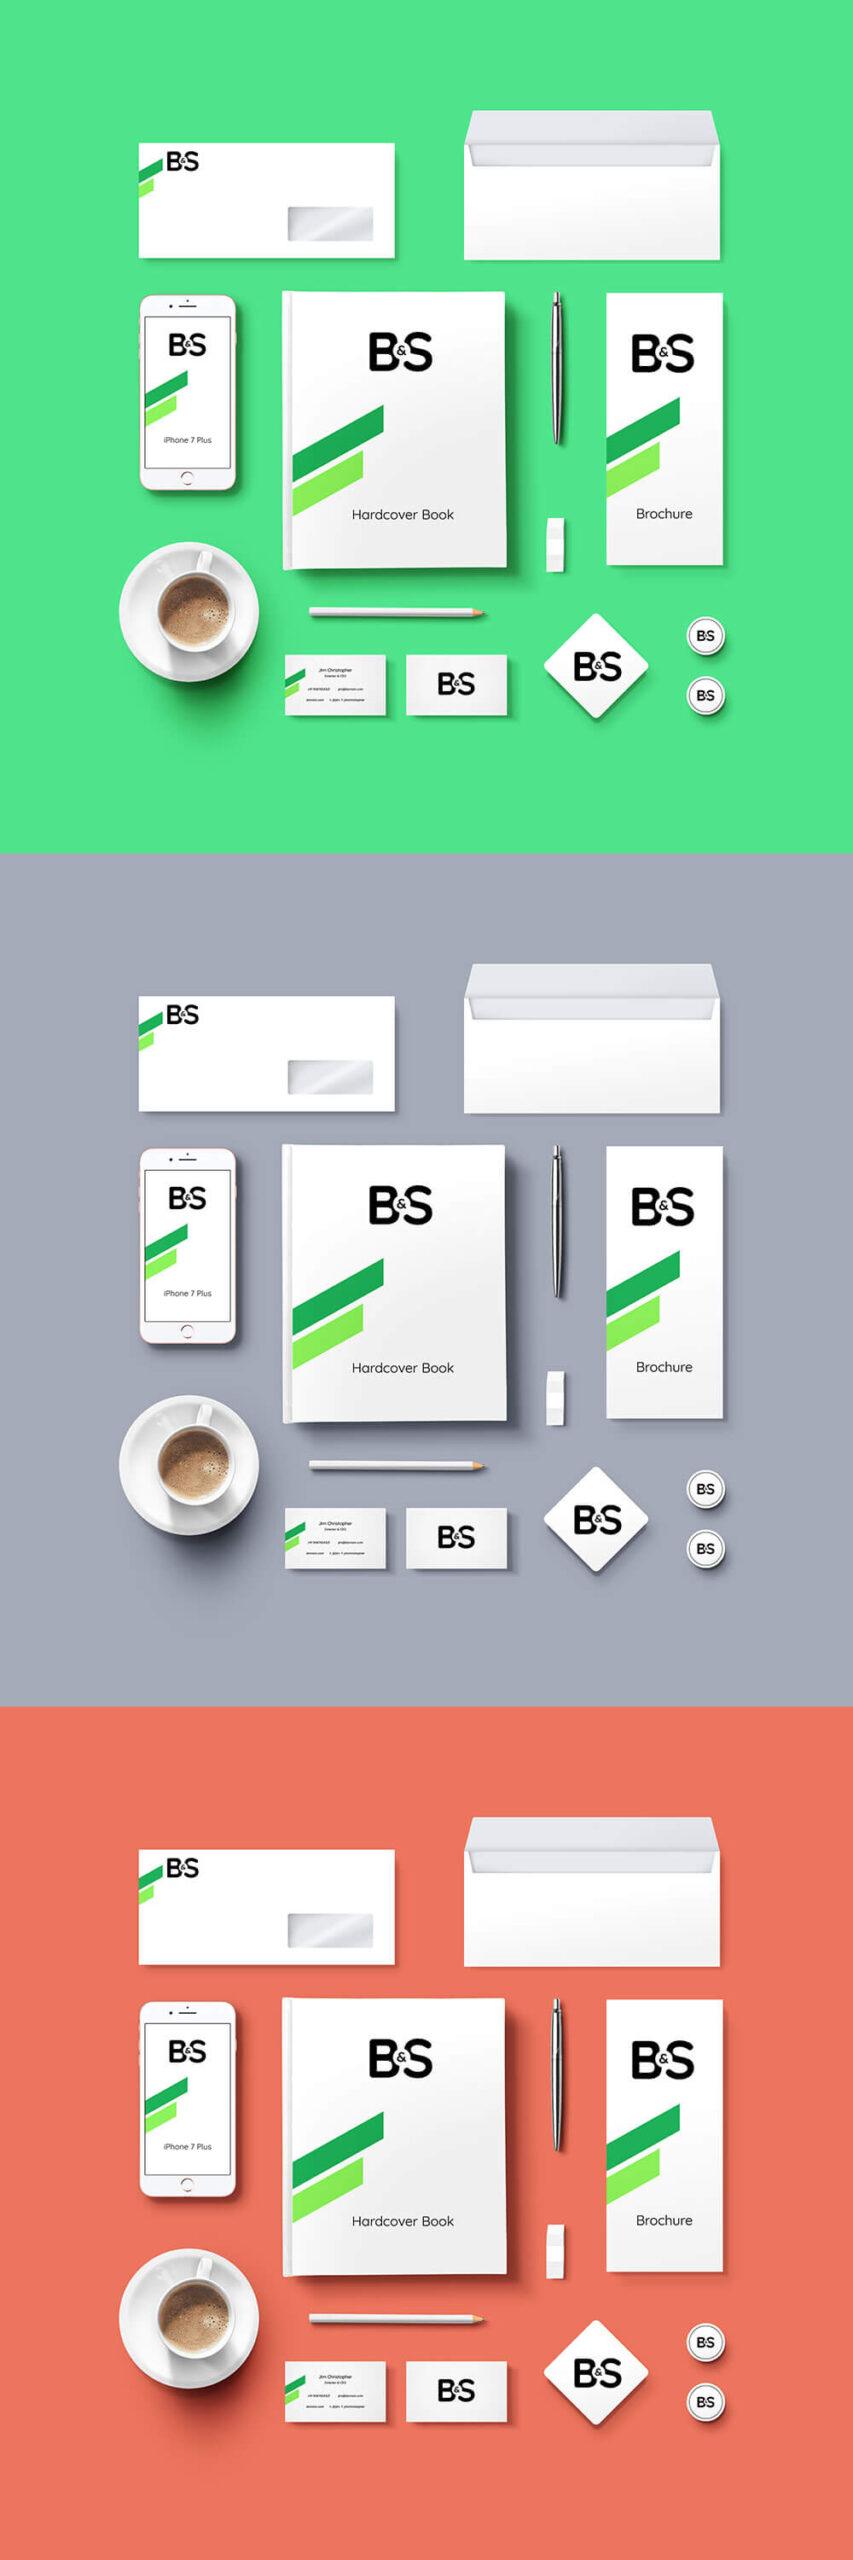 Free Branding & Stationery Mockup PSD Template1